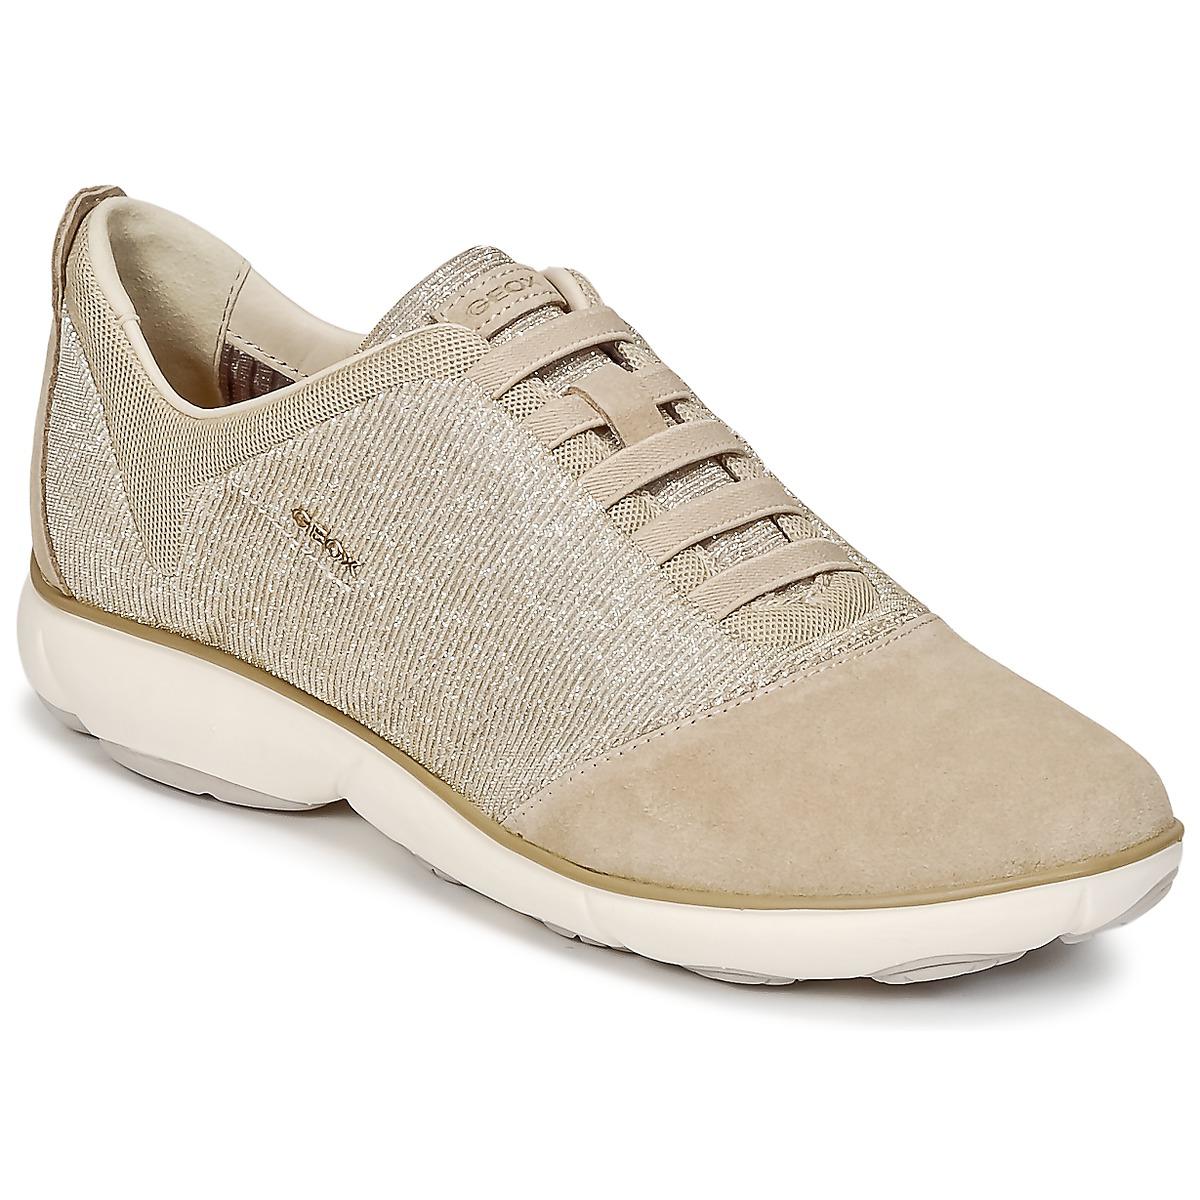 46d0e39afa6 Xαμηλά Sneakers Geox D NEBULA G, Γυναικεία sneakers, ΓΥΝΑΙΚΑ ...